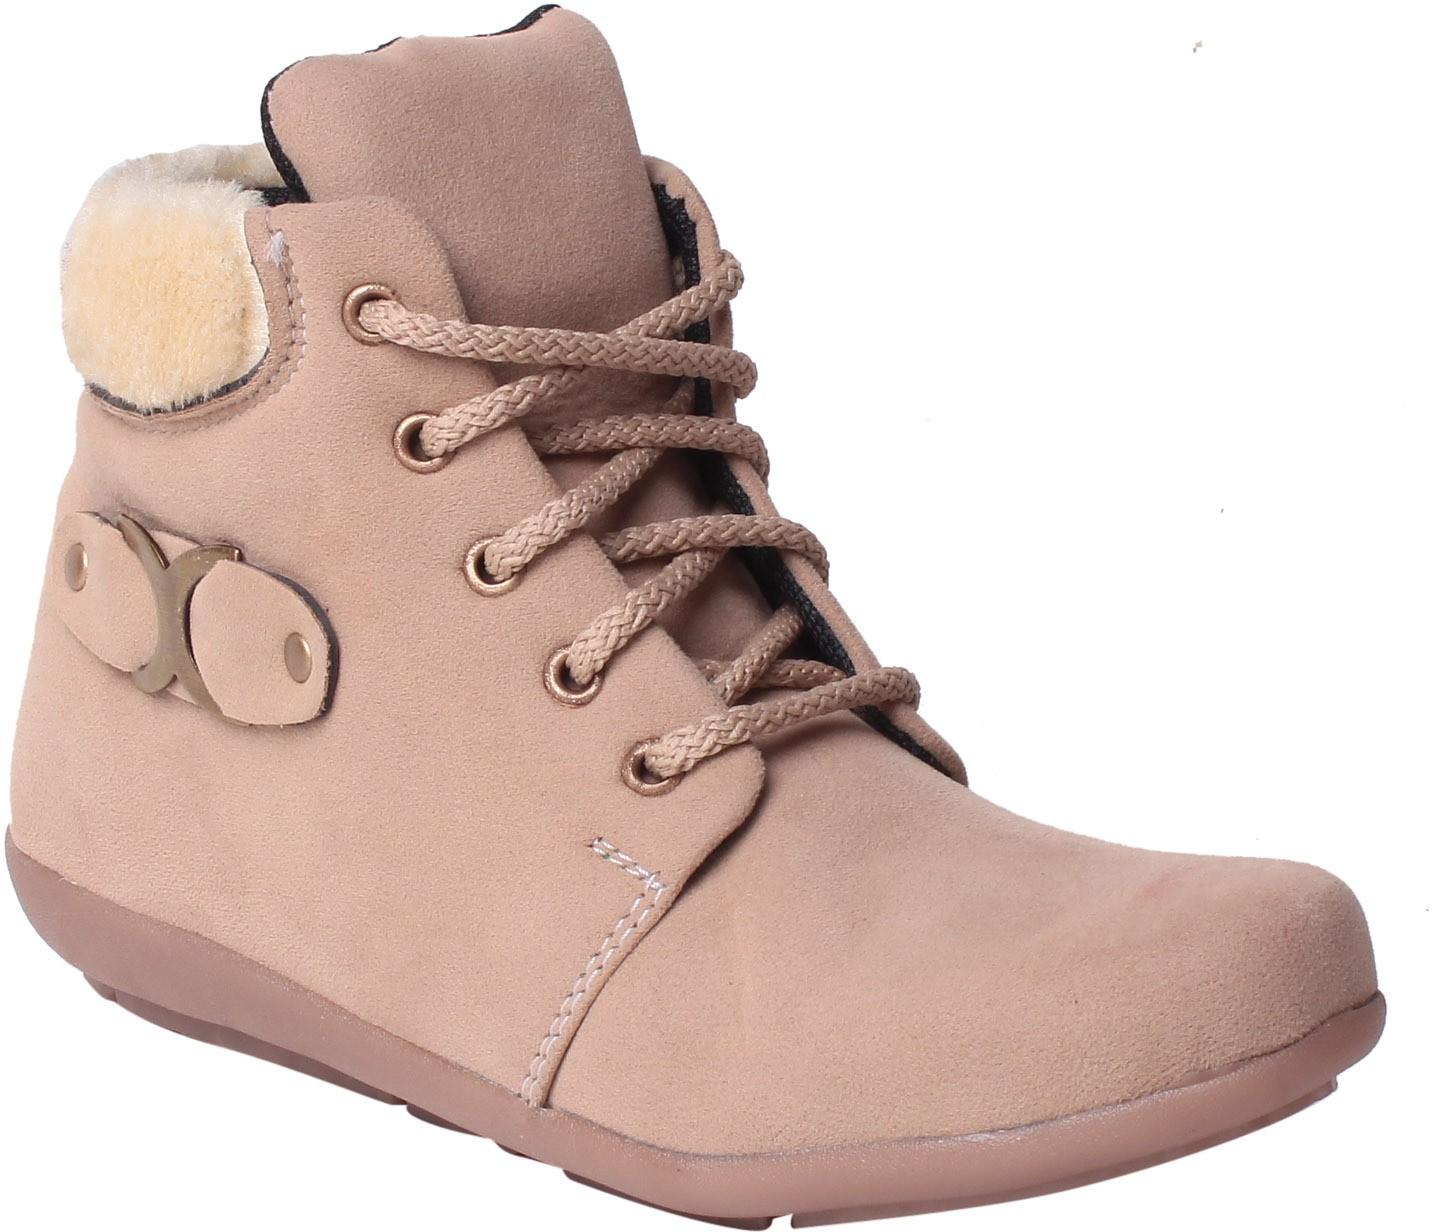 MSC Boots(Beige)